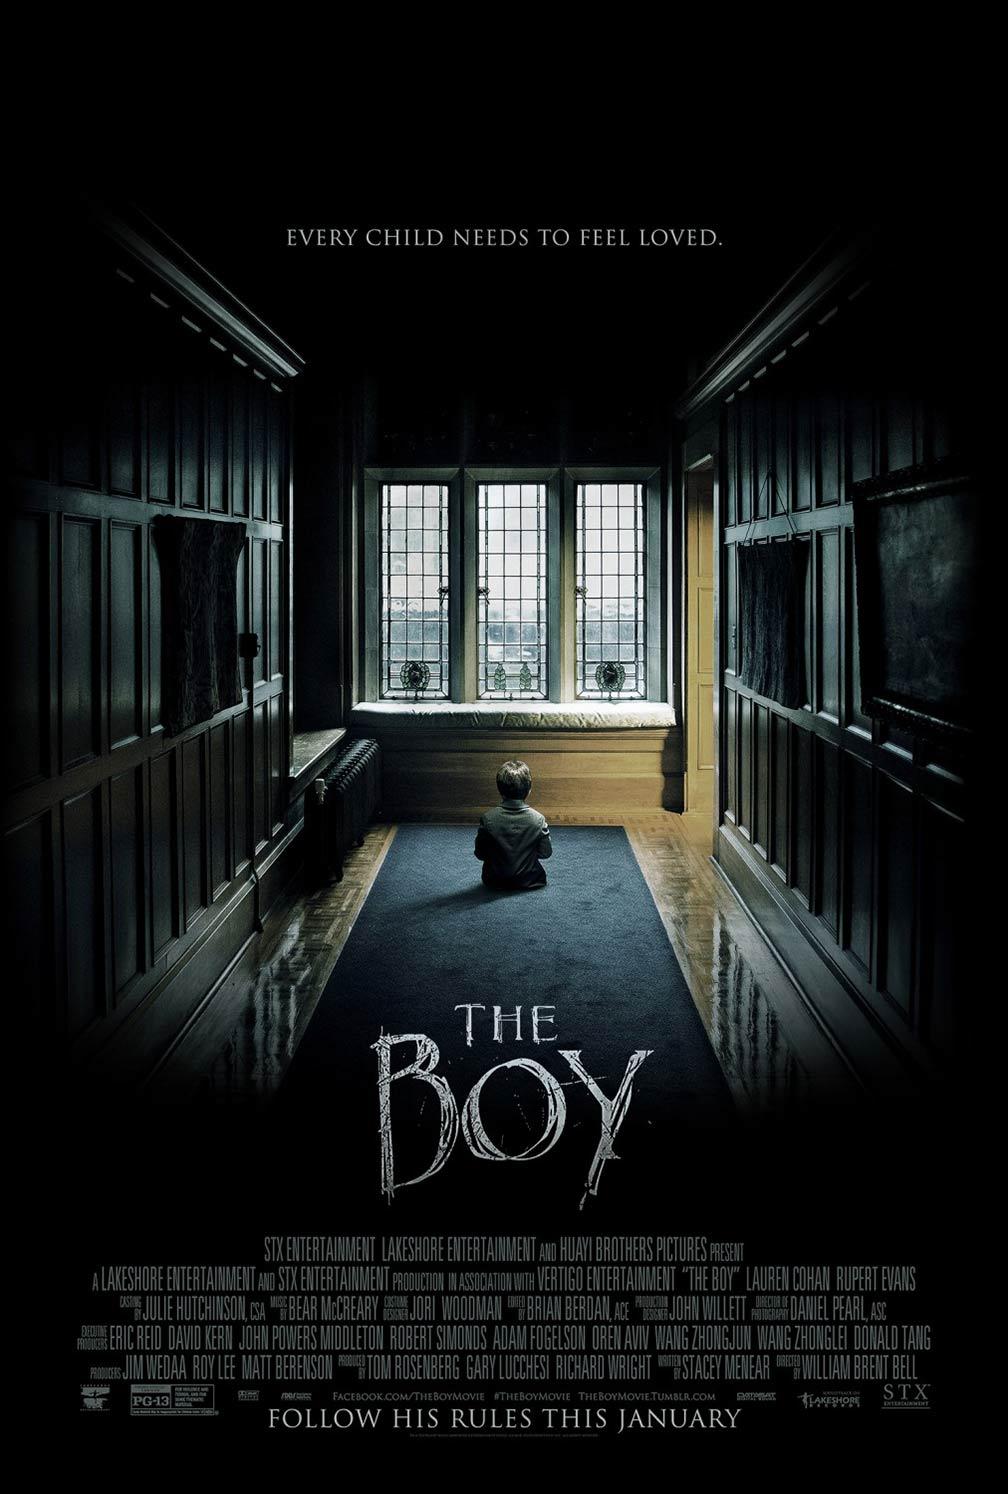 https://i1.wp.com/cdn.traileraddict.com/content/stx-entertainment/the-boy-2016.jpg